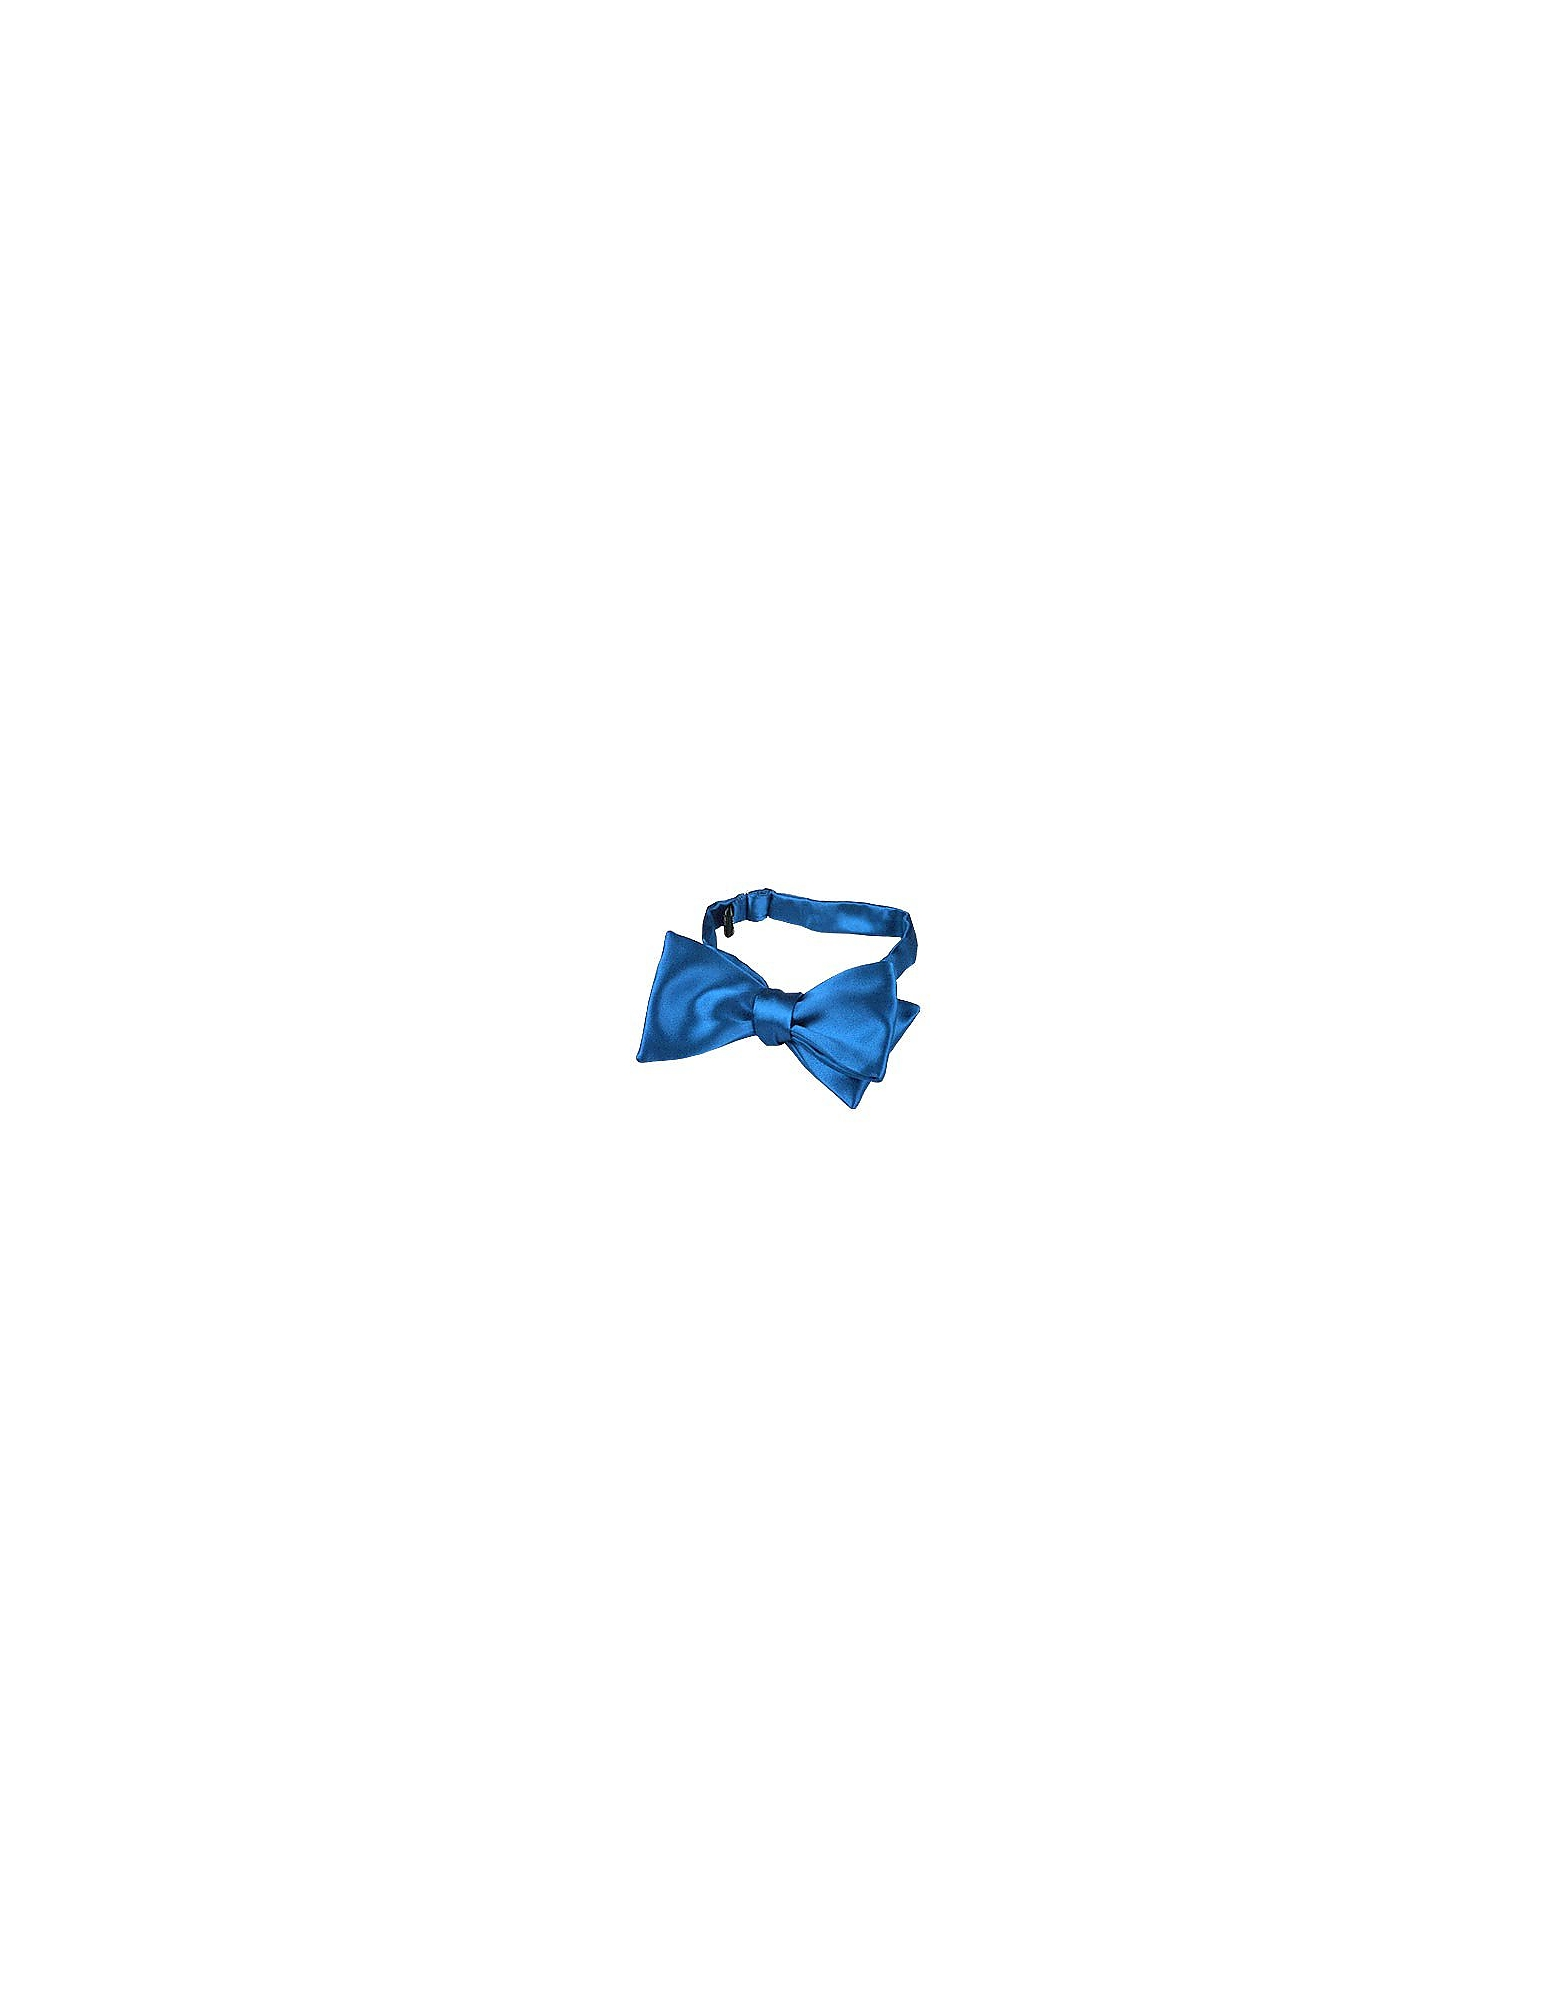 Forzieri Bowties and Cummerbunds, Sky Blue Solid Silk Self-tie Bowtie